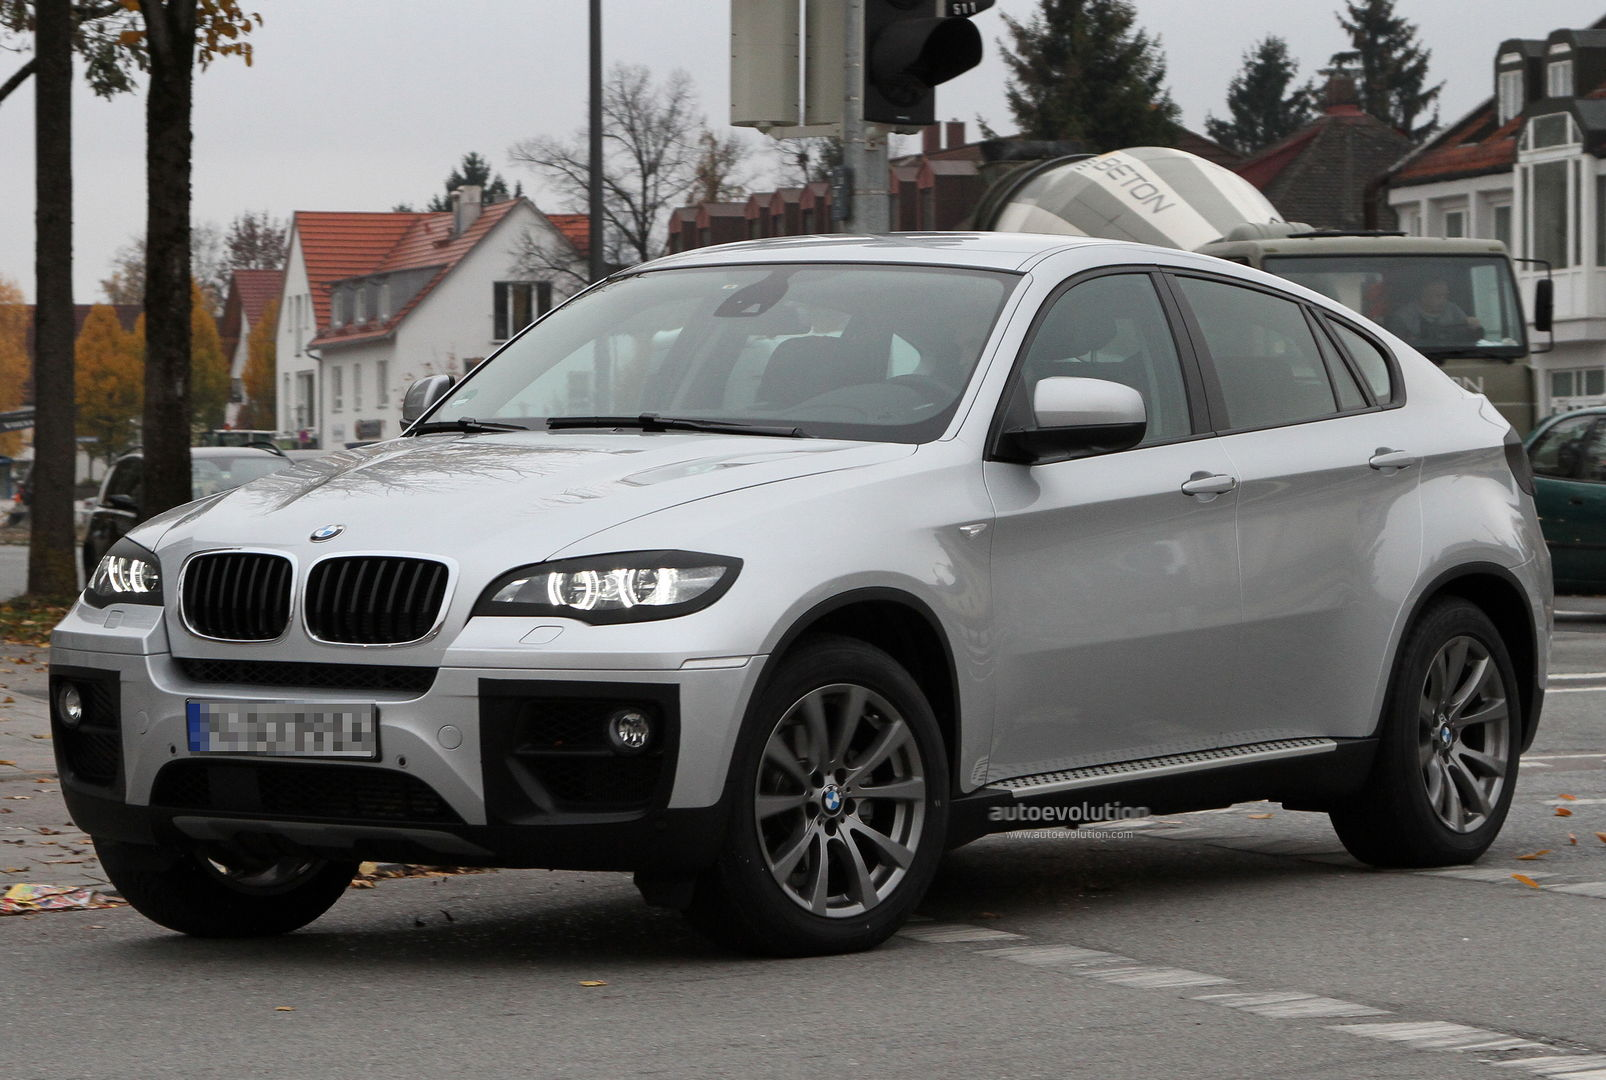 BMW X6 facelift spied